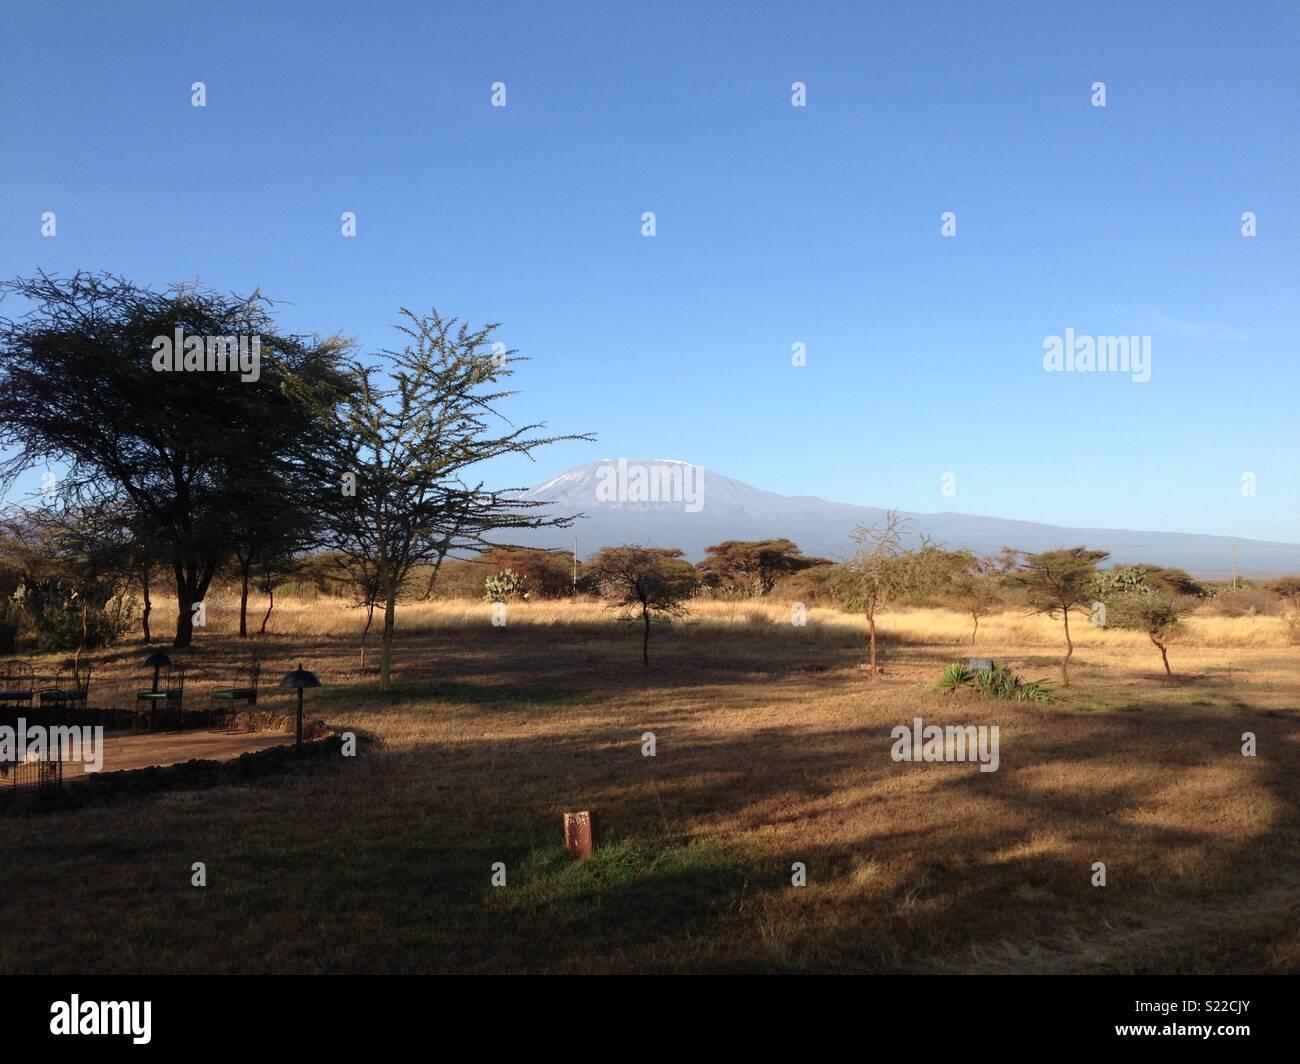 Mount Kilimanjaro - Stock Image